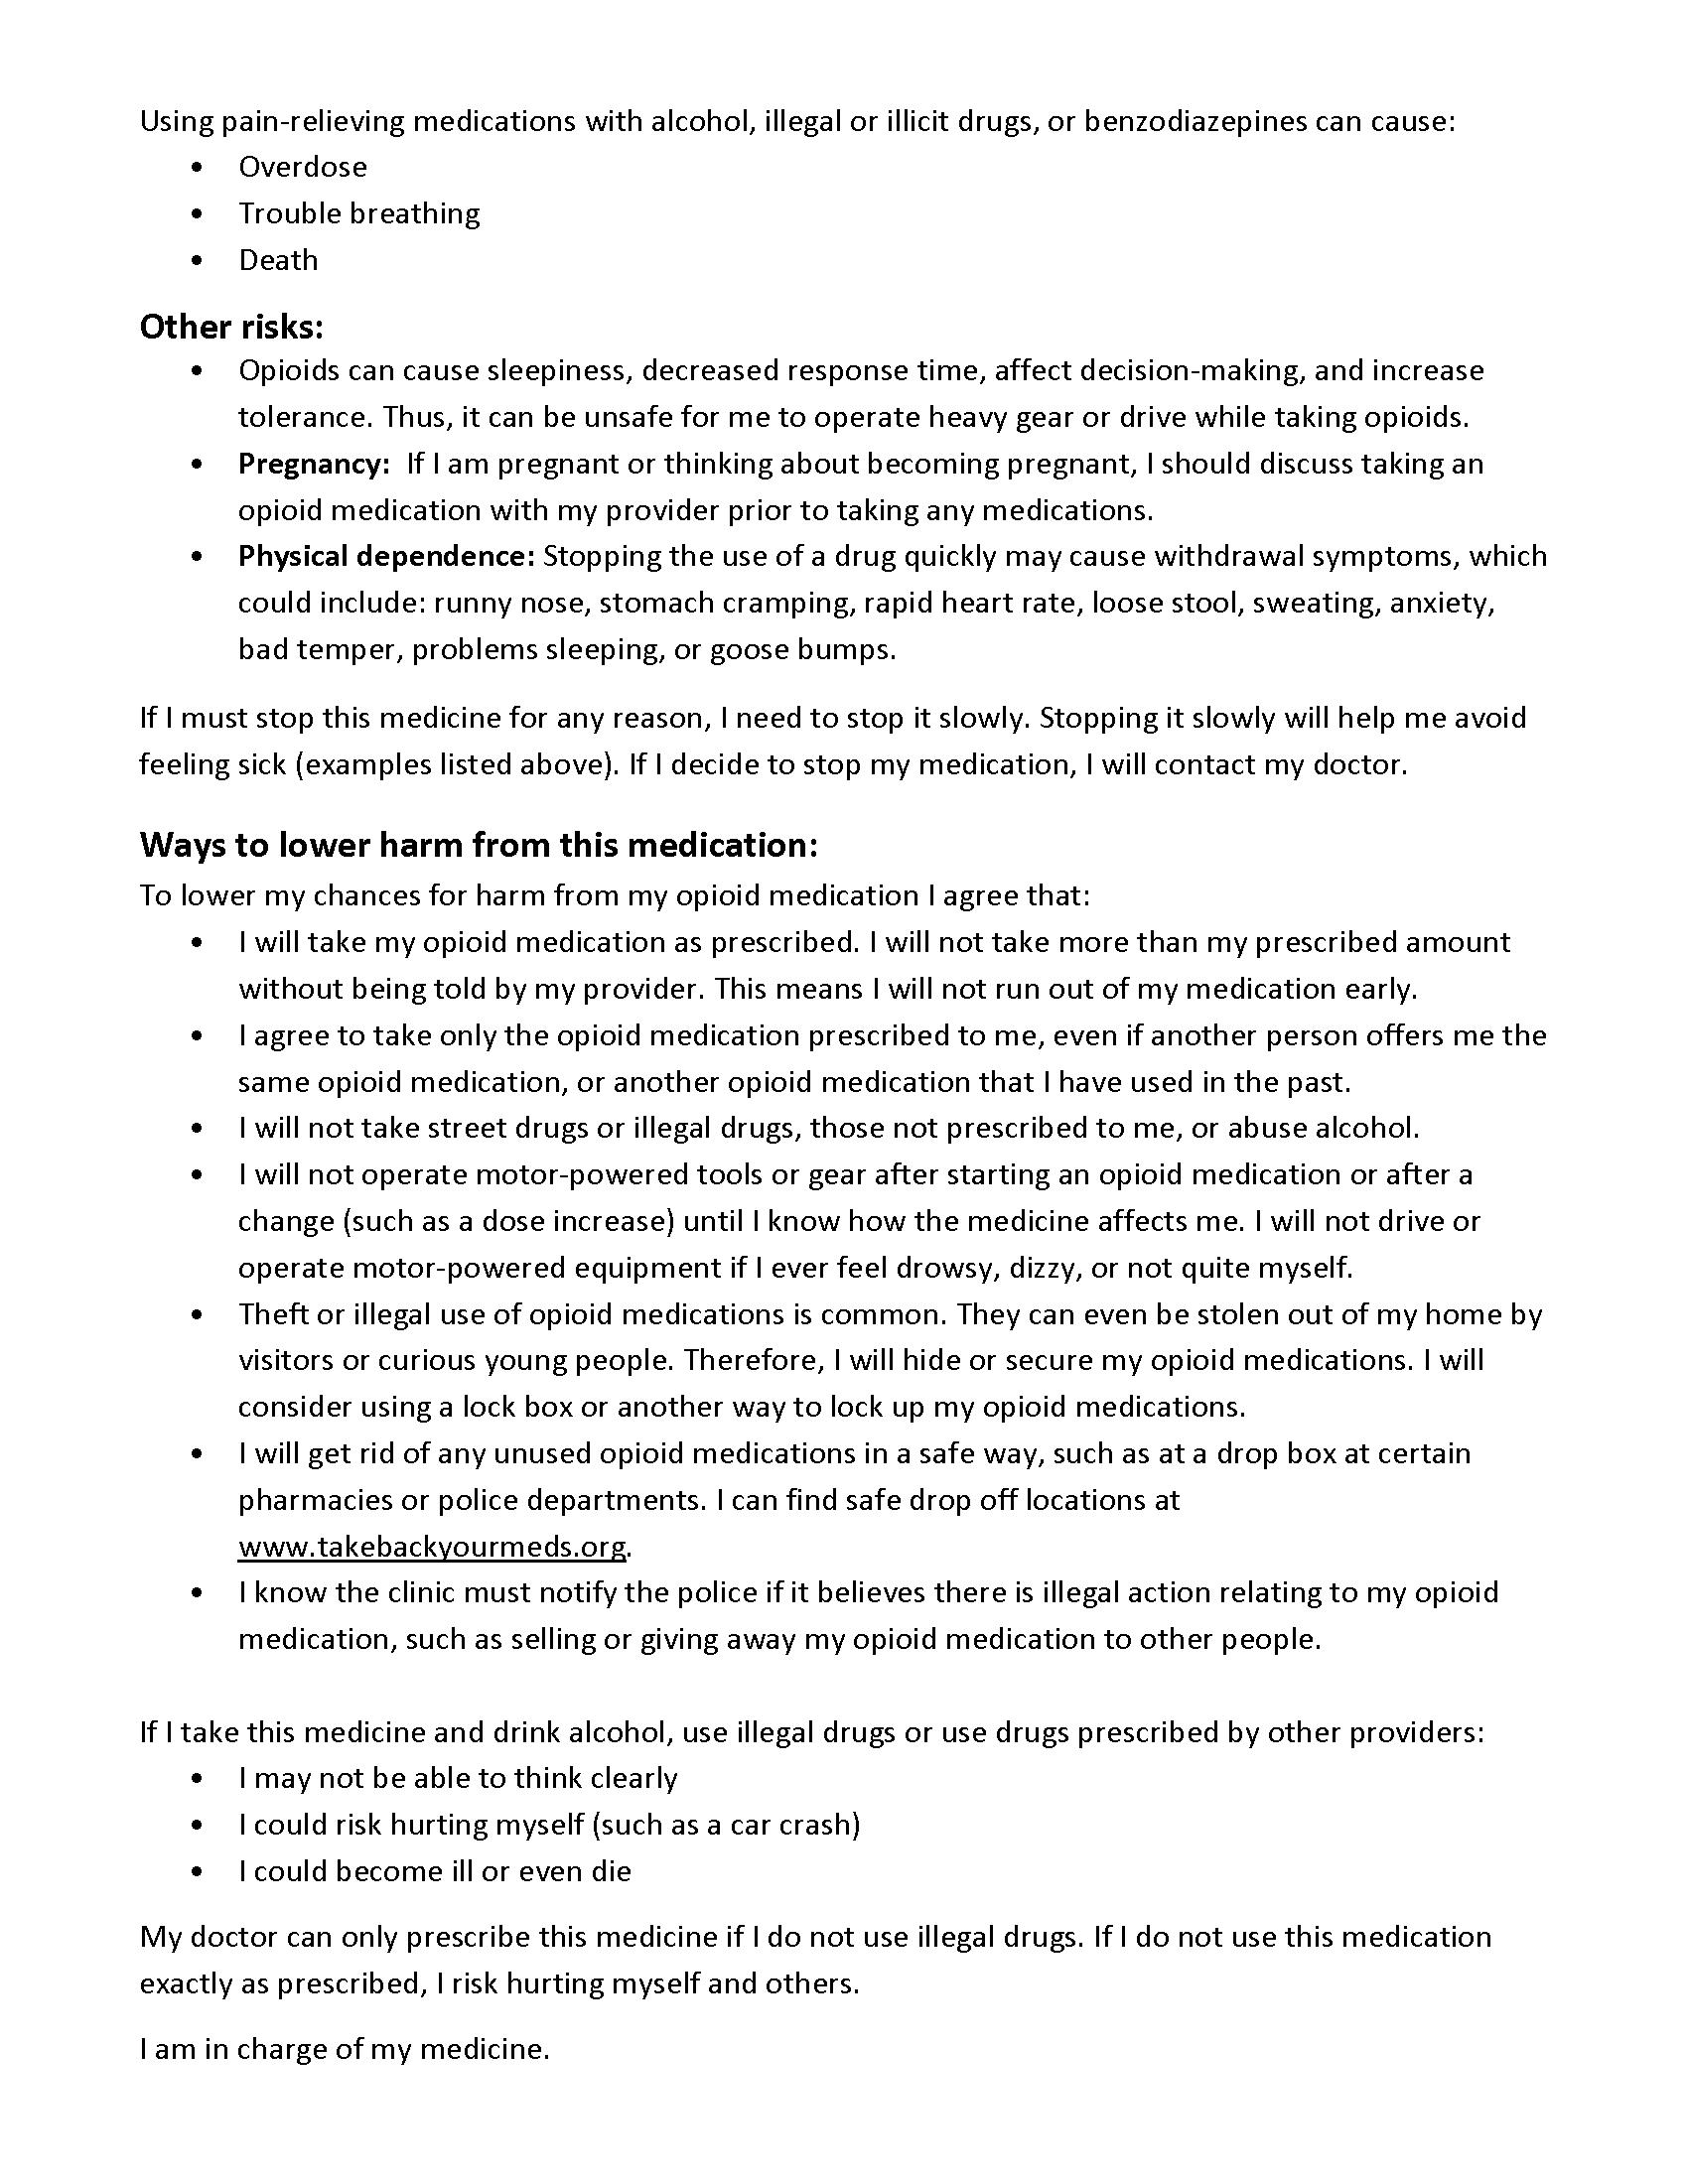 Sample Pain Management Agreements | U-M Injury Center